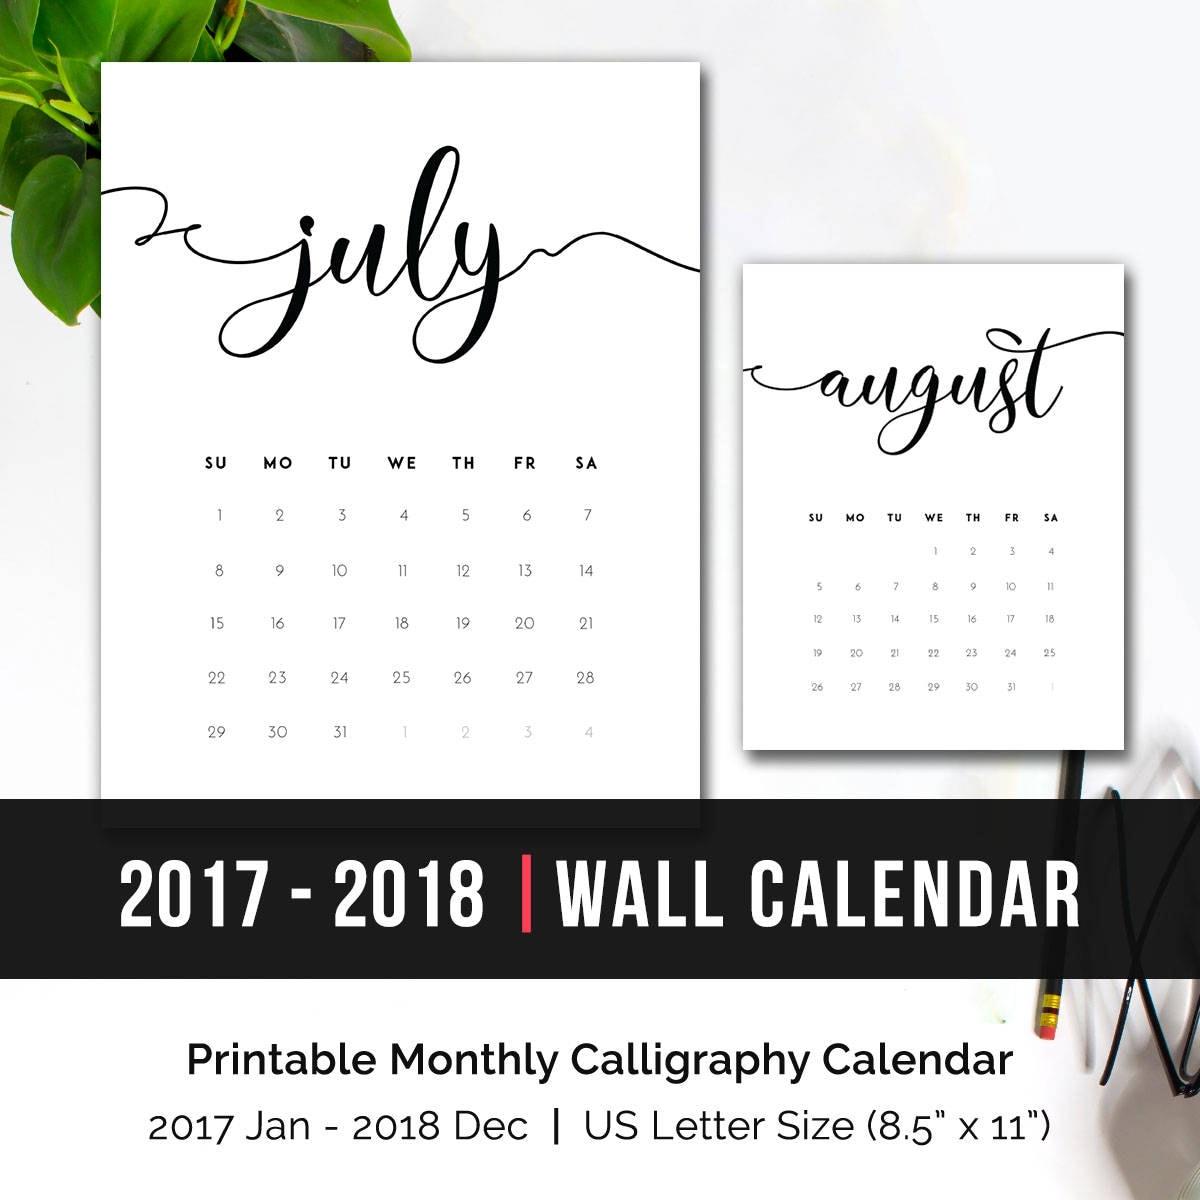 2018 Calendar Minimalist Printable : Printable calendar monthly wall